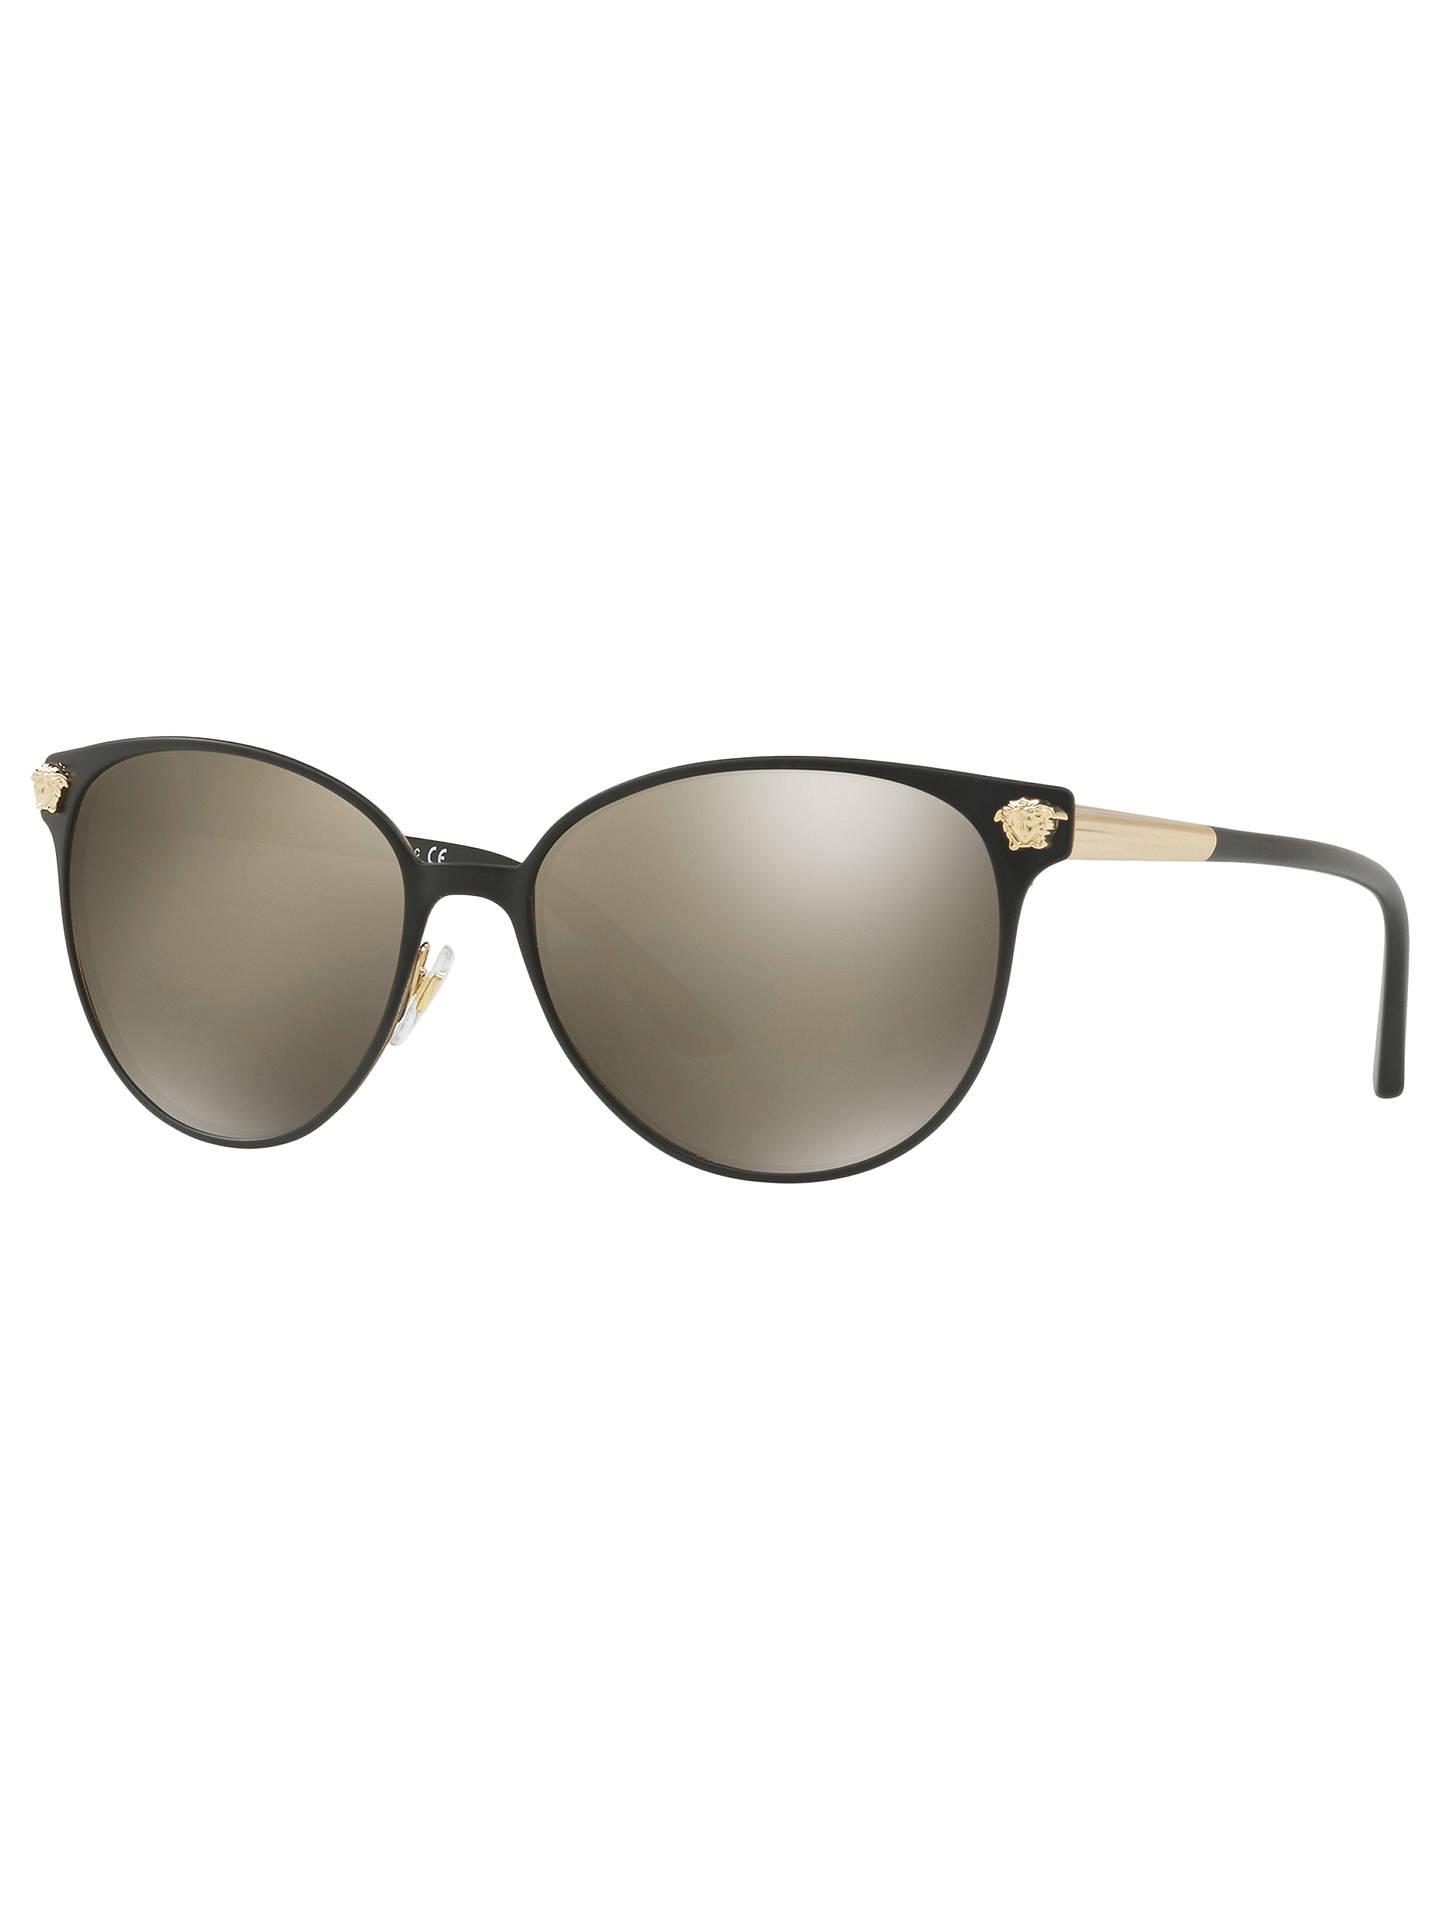 1f5deb48913b Buy Versace VE2168 Men s Oval Sunglasses